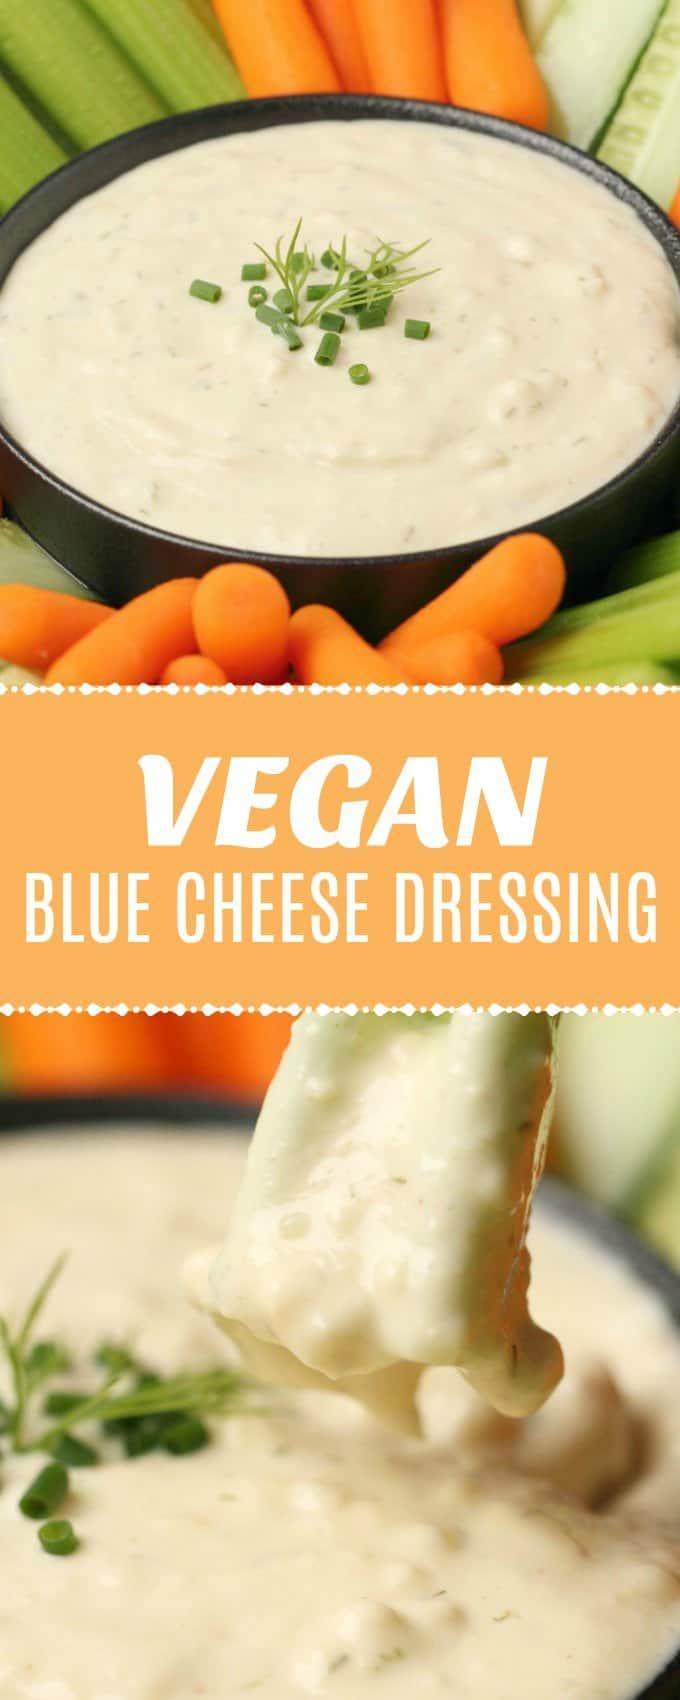 Vegan Blue Cheese Dressing